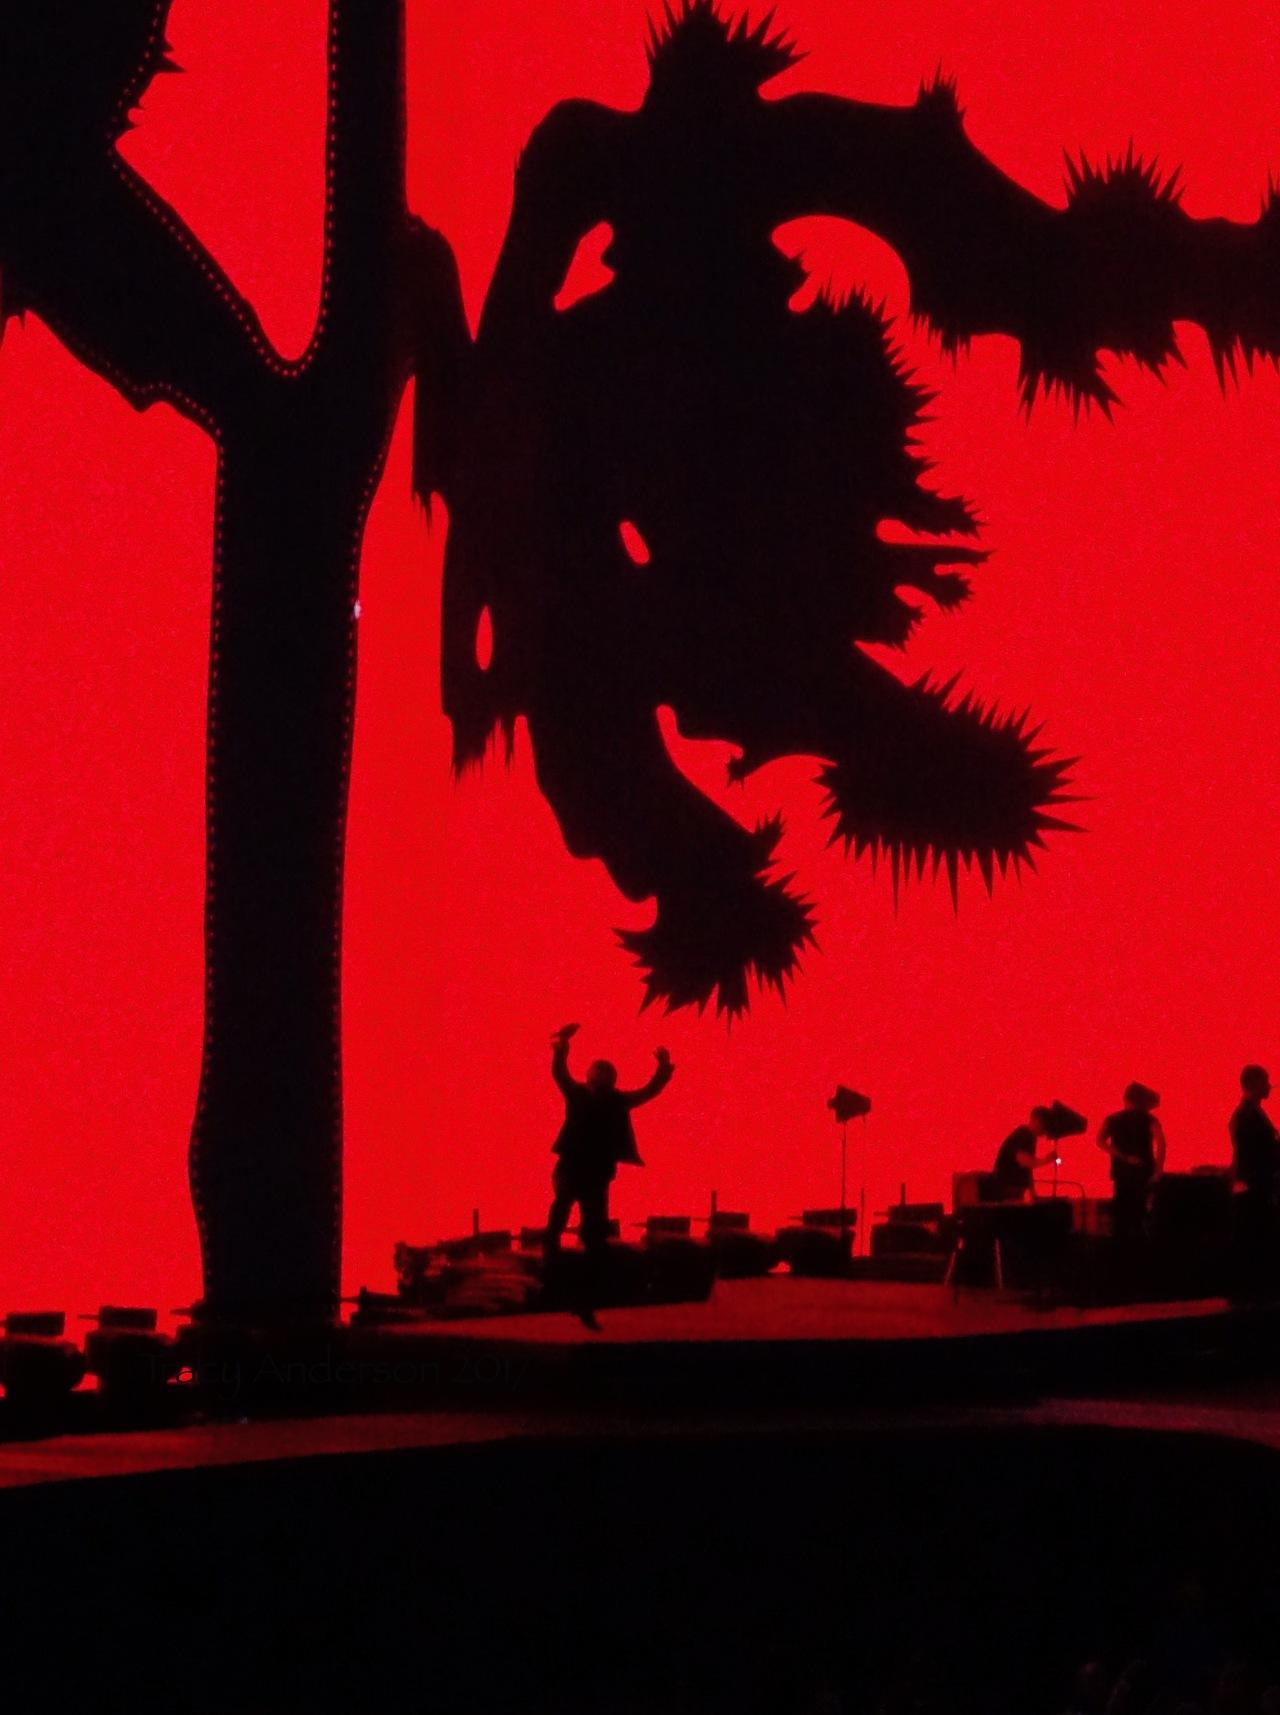 Bono in Air Streets Silhouette Croke Park Dublin U2 The Joshua Tree July 22 2017